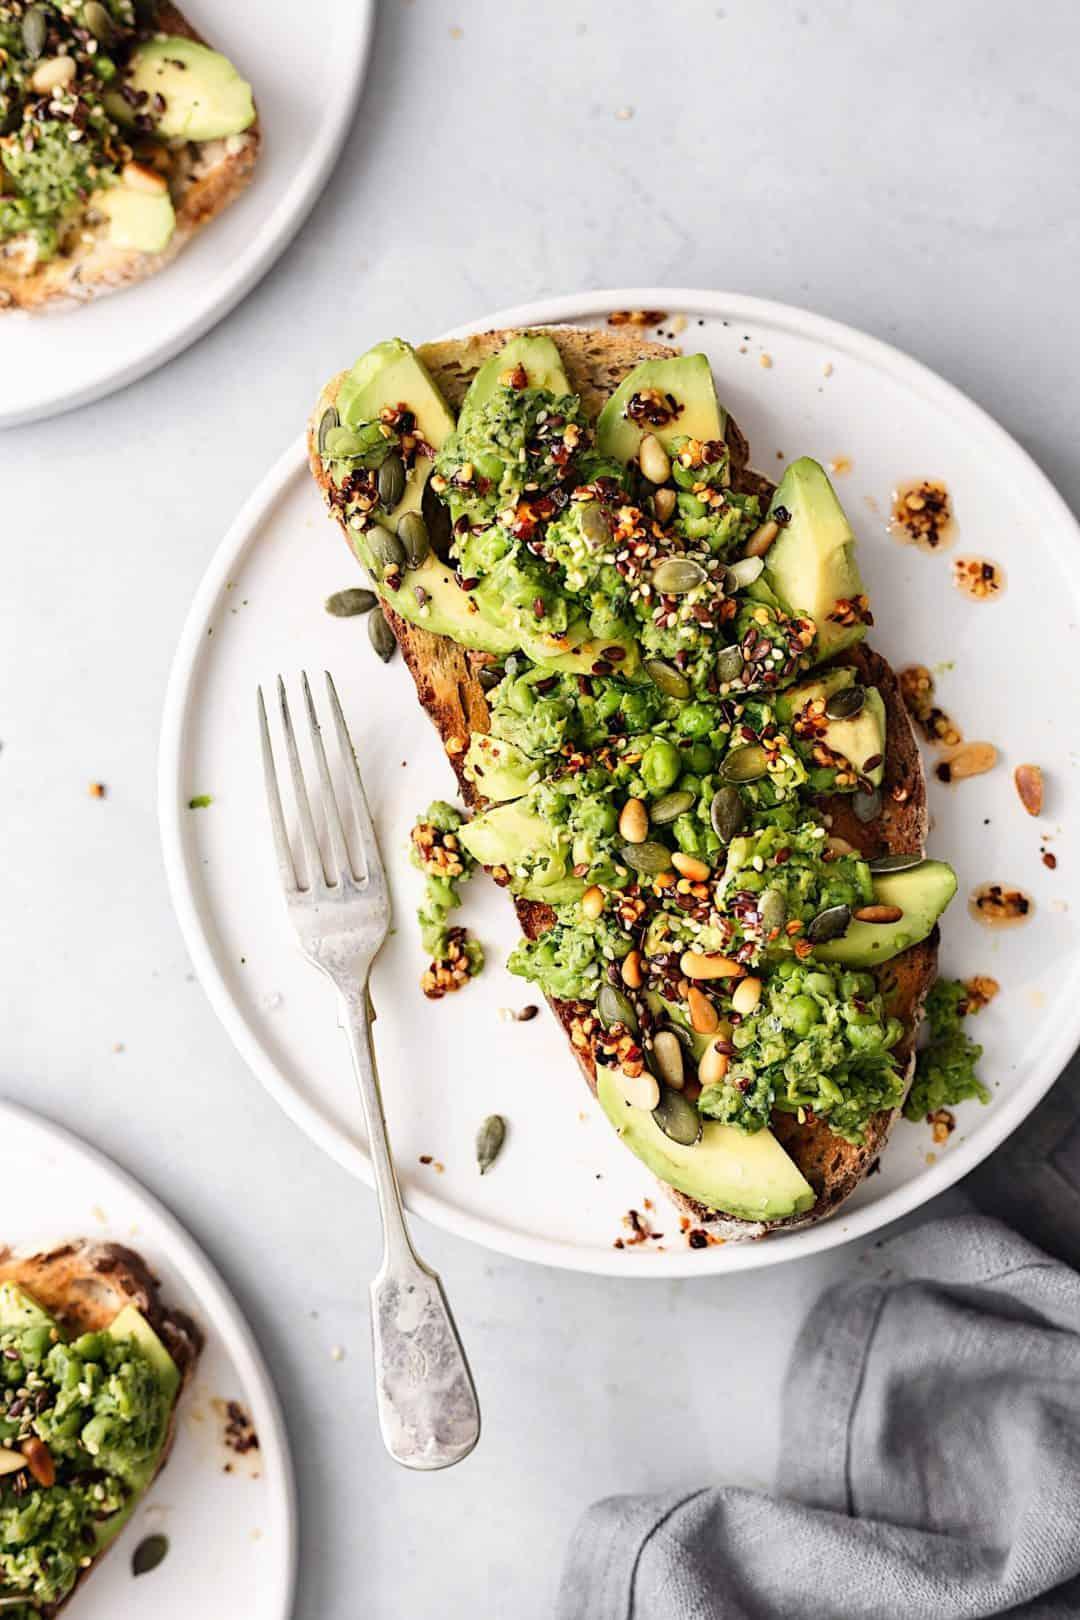 Smashed Peas and Avocado on Toast #vegan #recipe #breakfast #avocado